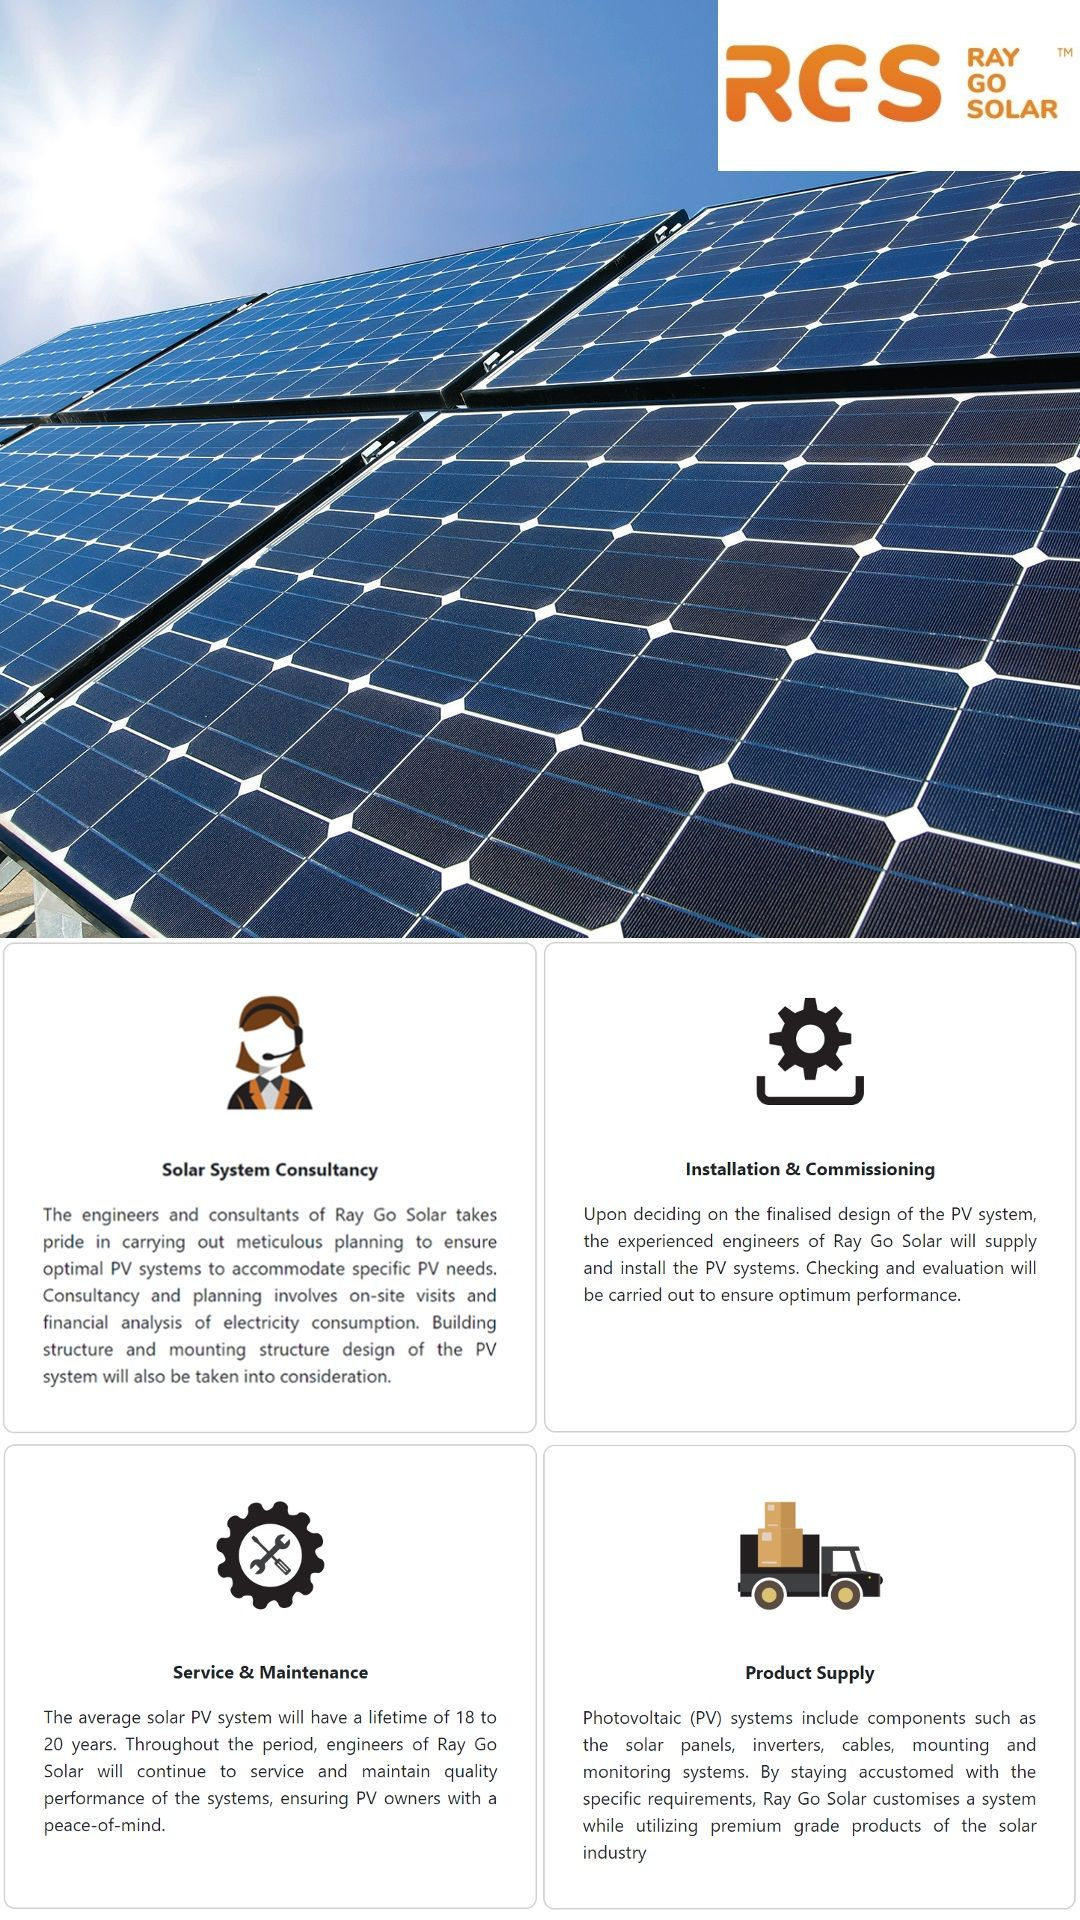 Ray Go Solar Services Solar Pv System Roof Solar Panel